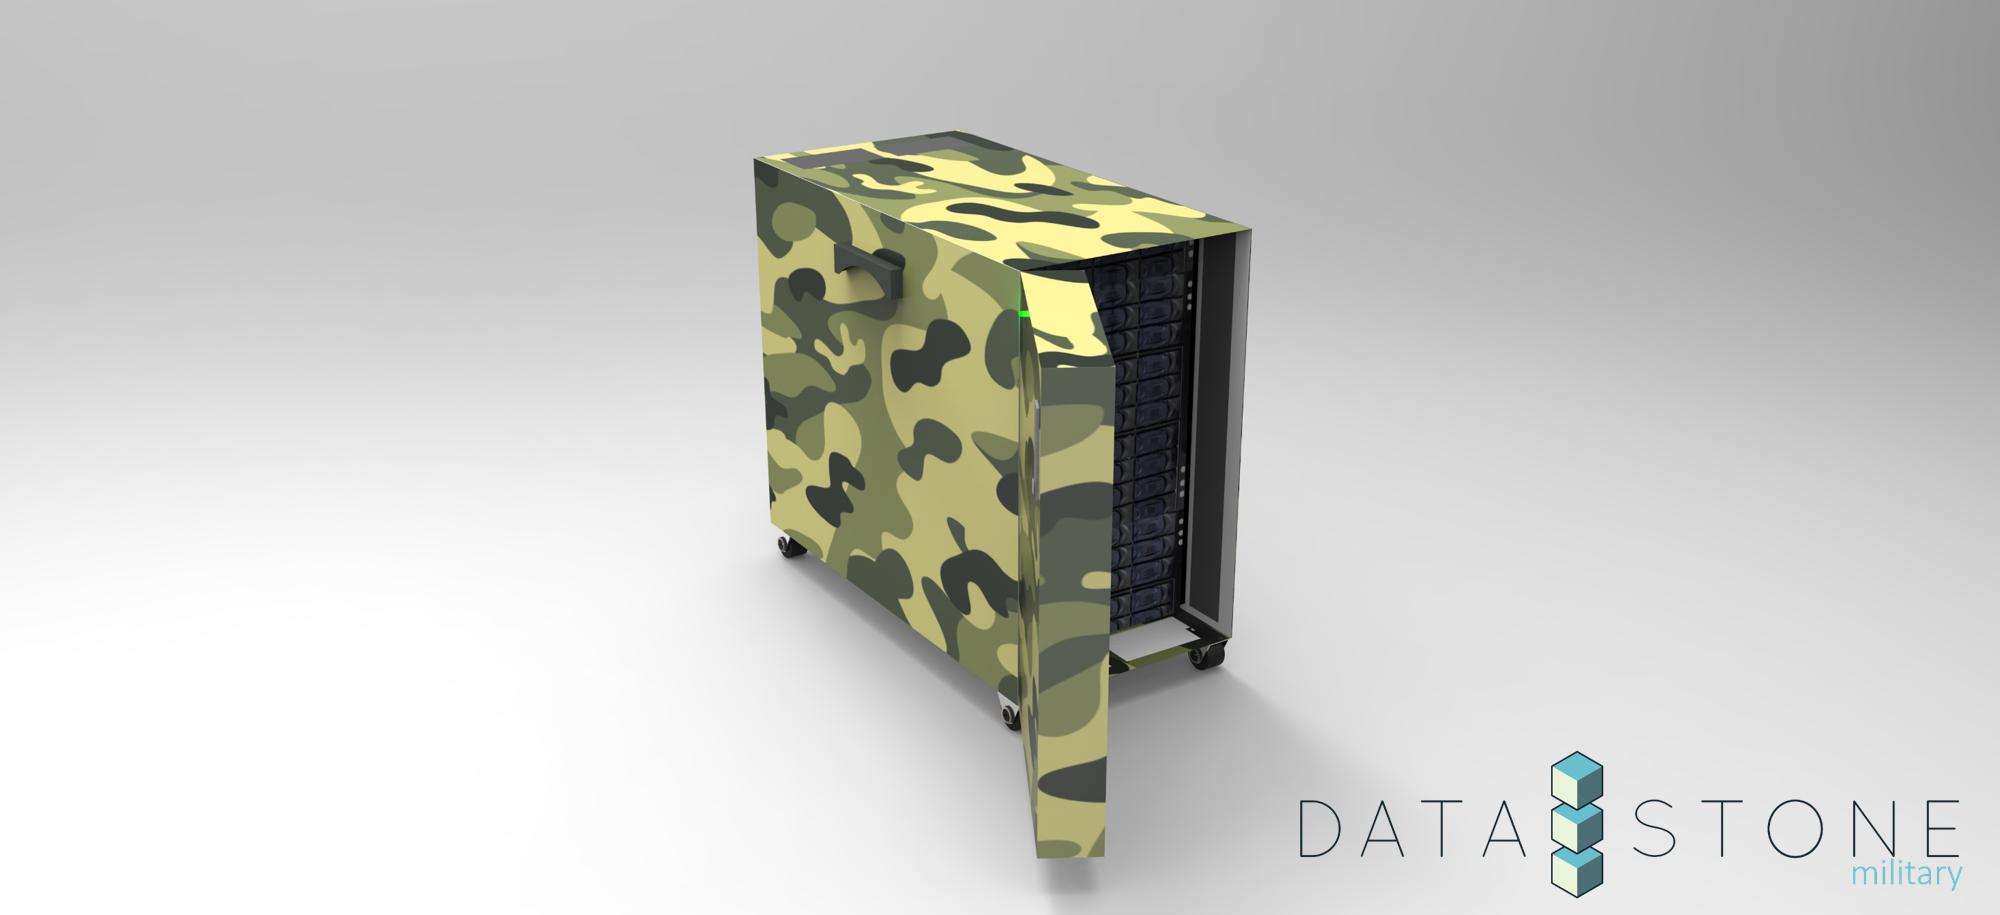 DataStone military